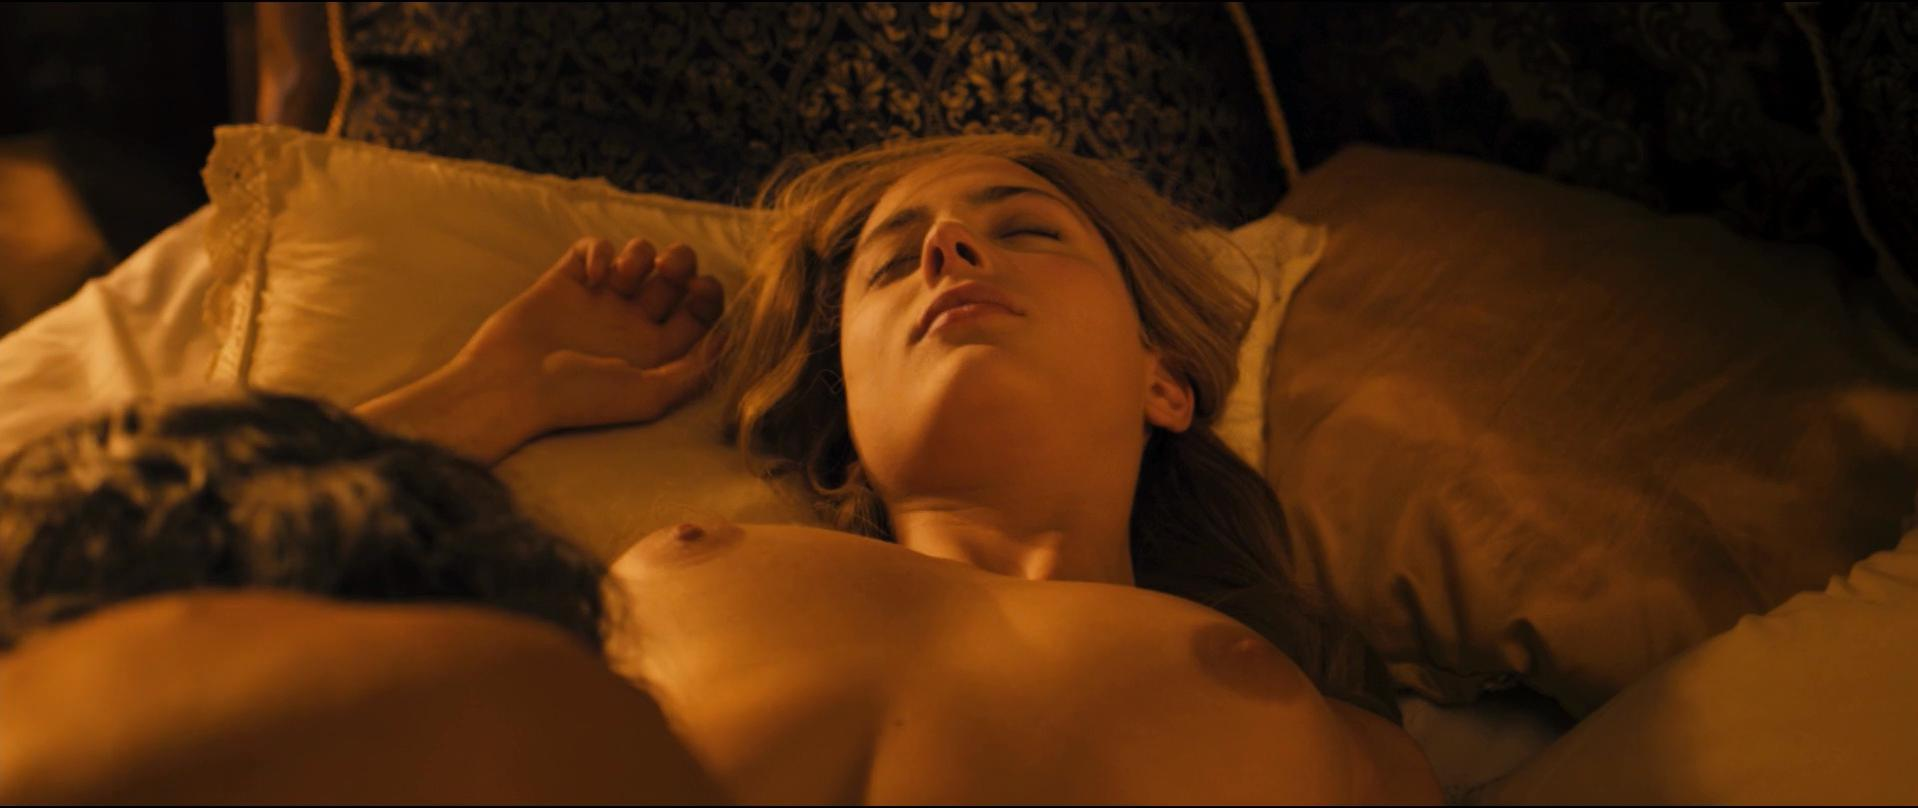 Nora Arnezeder nude - Angelique (2013)